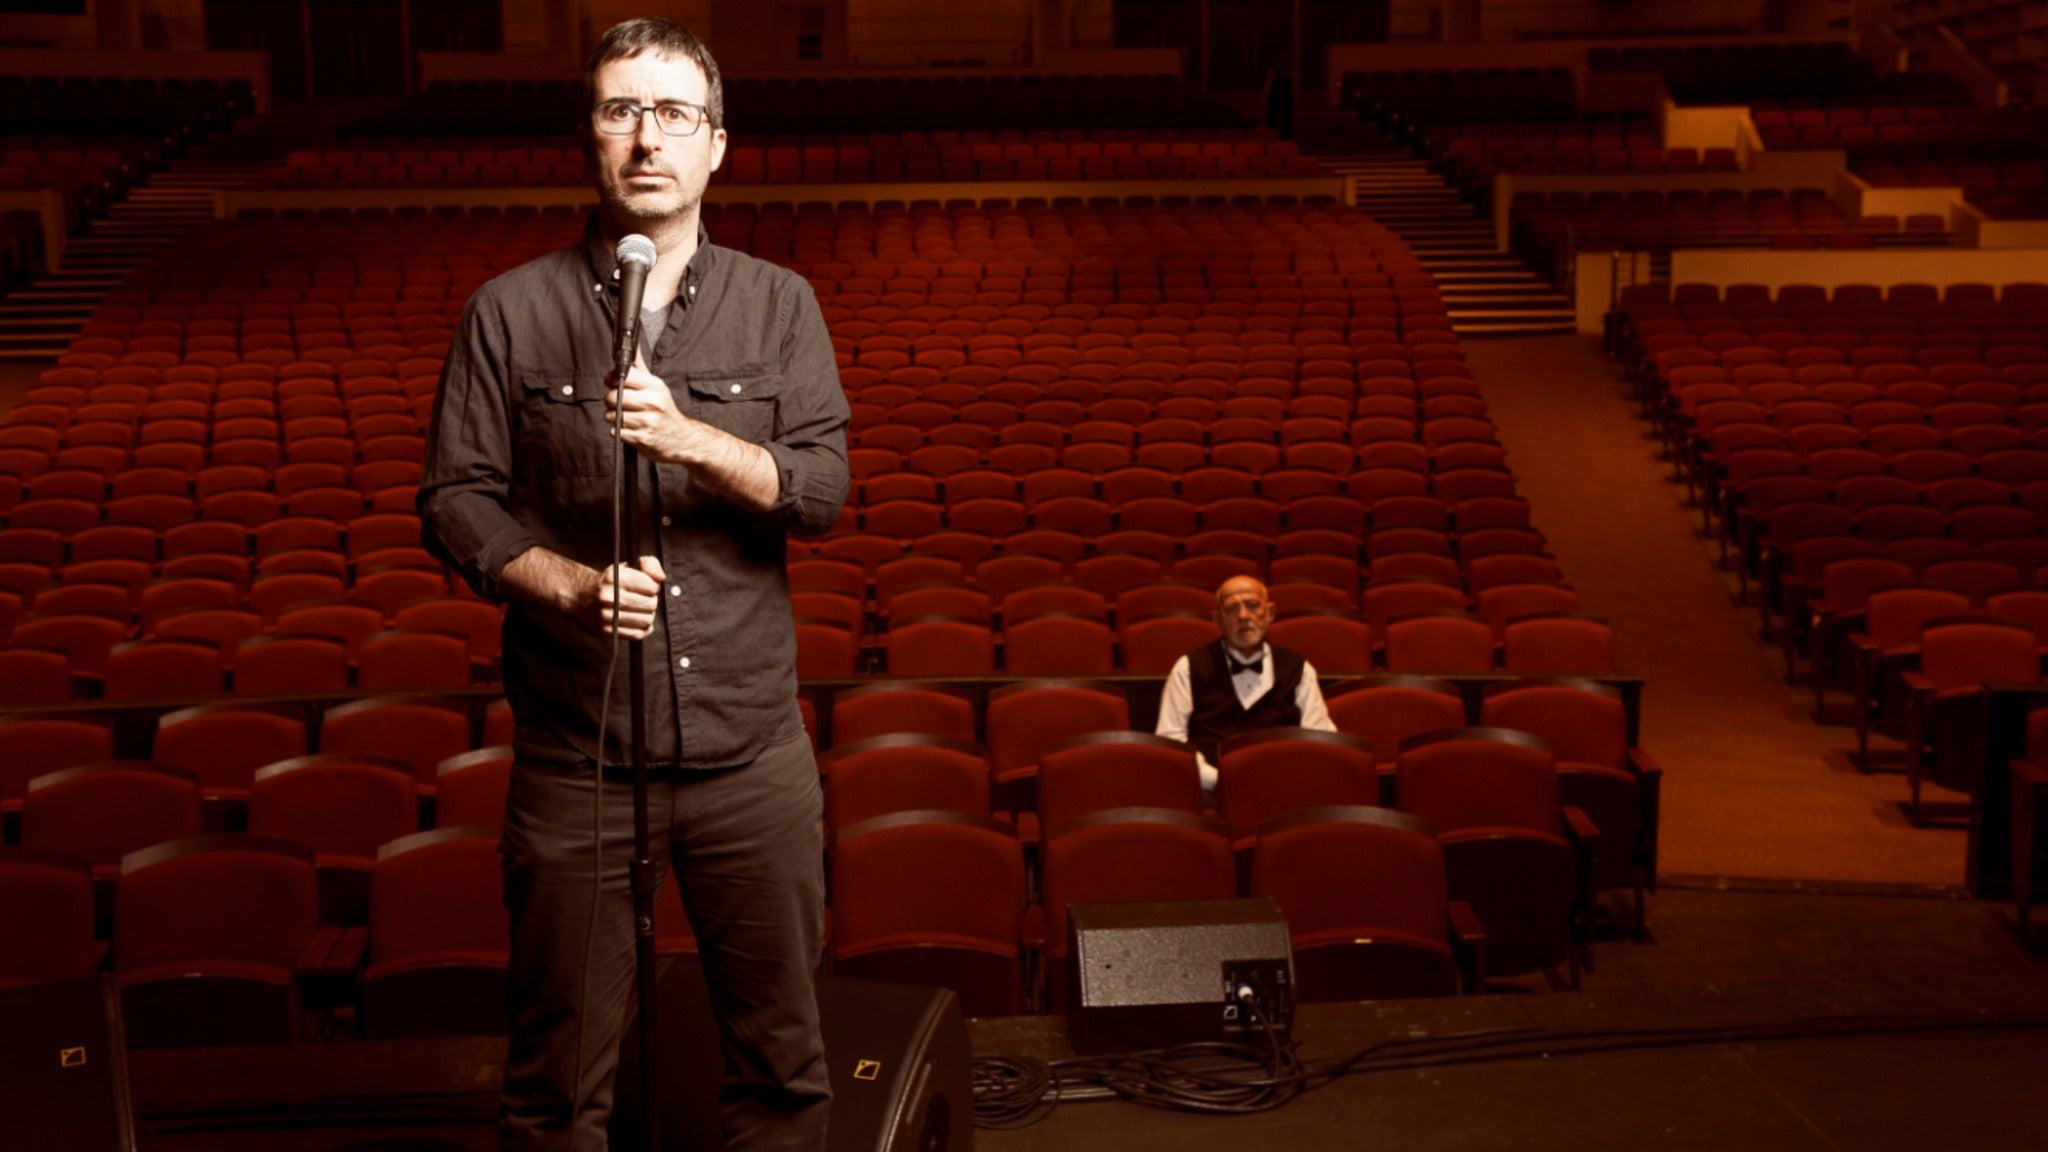 John Oliver Live at Fox Theatre Detroit